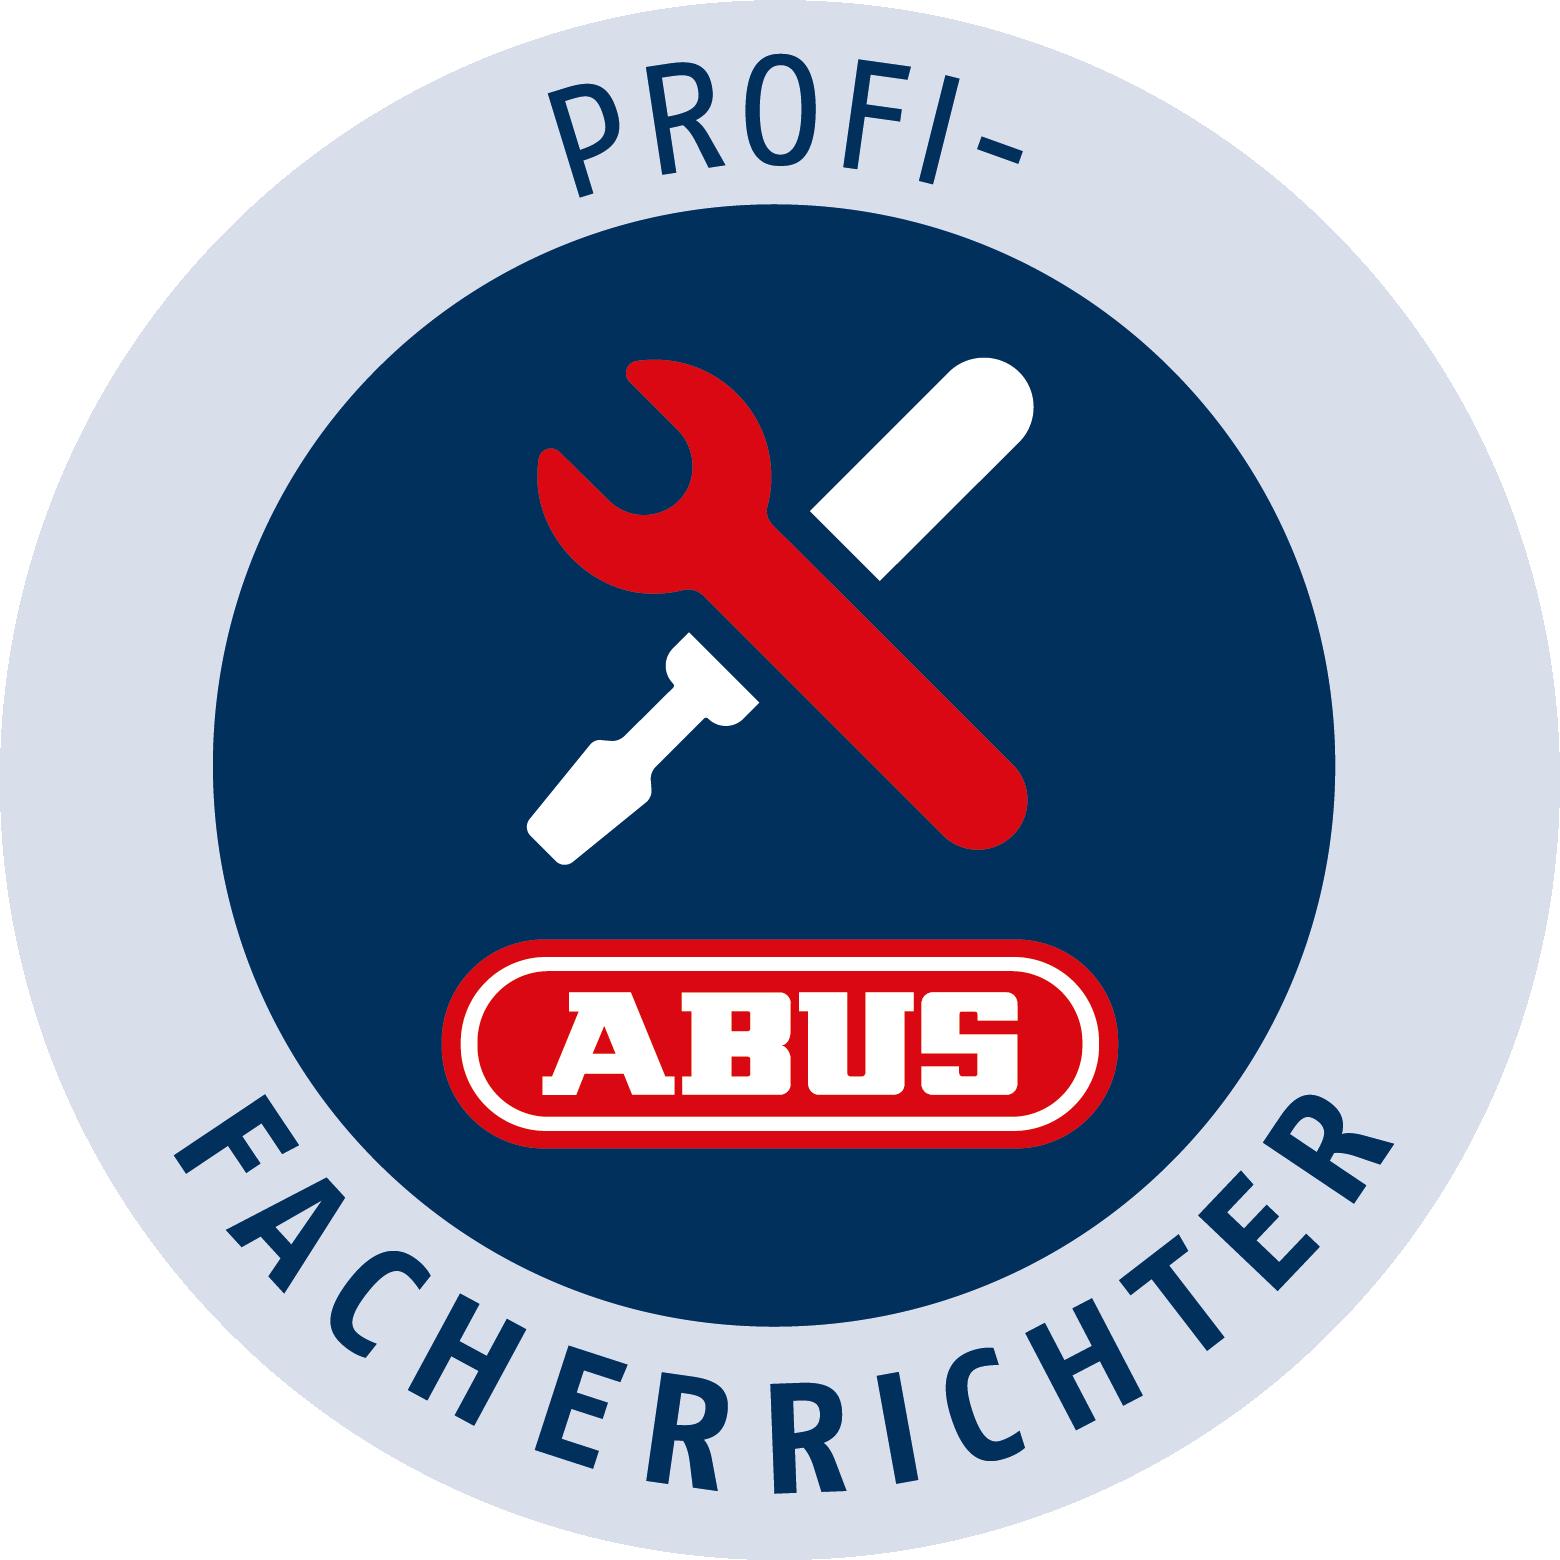 Siegel der ABUS Profi Facherrichter